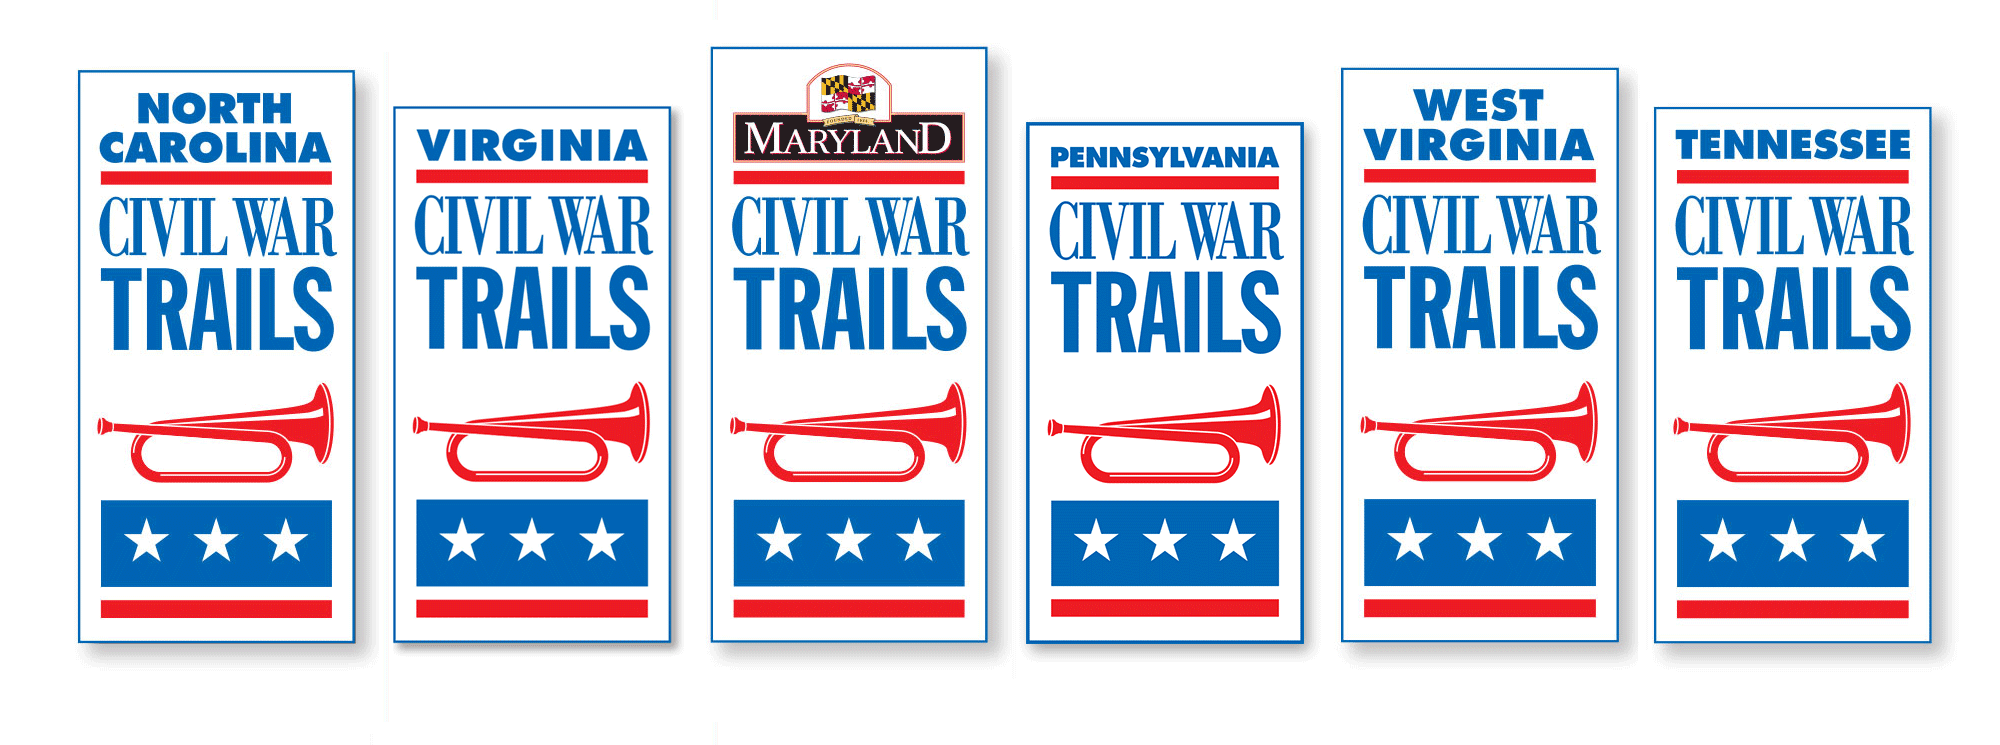 Trail Blazer Signs